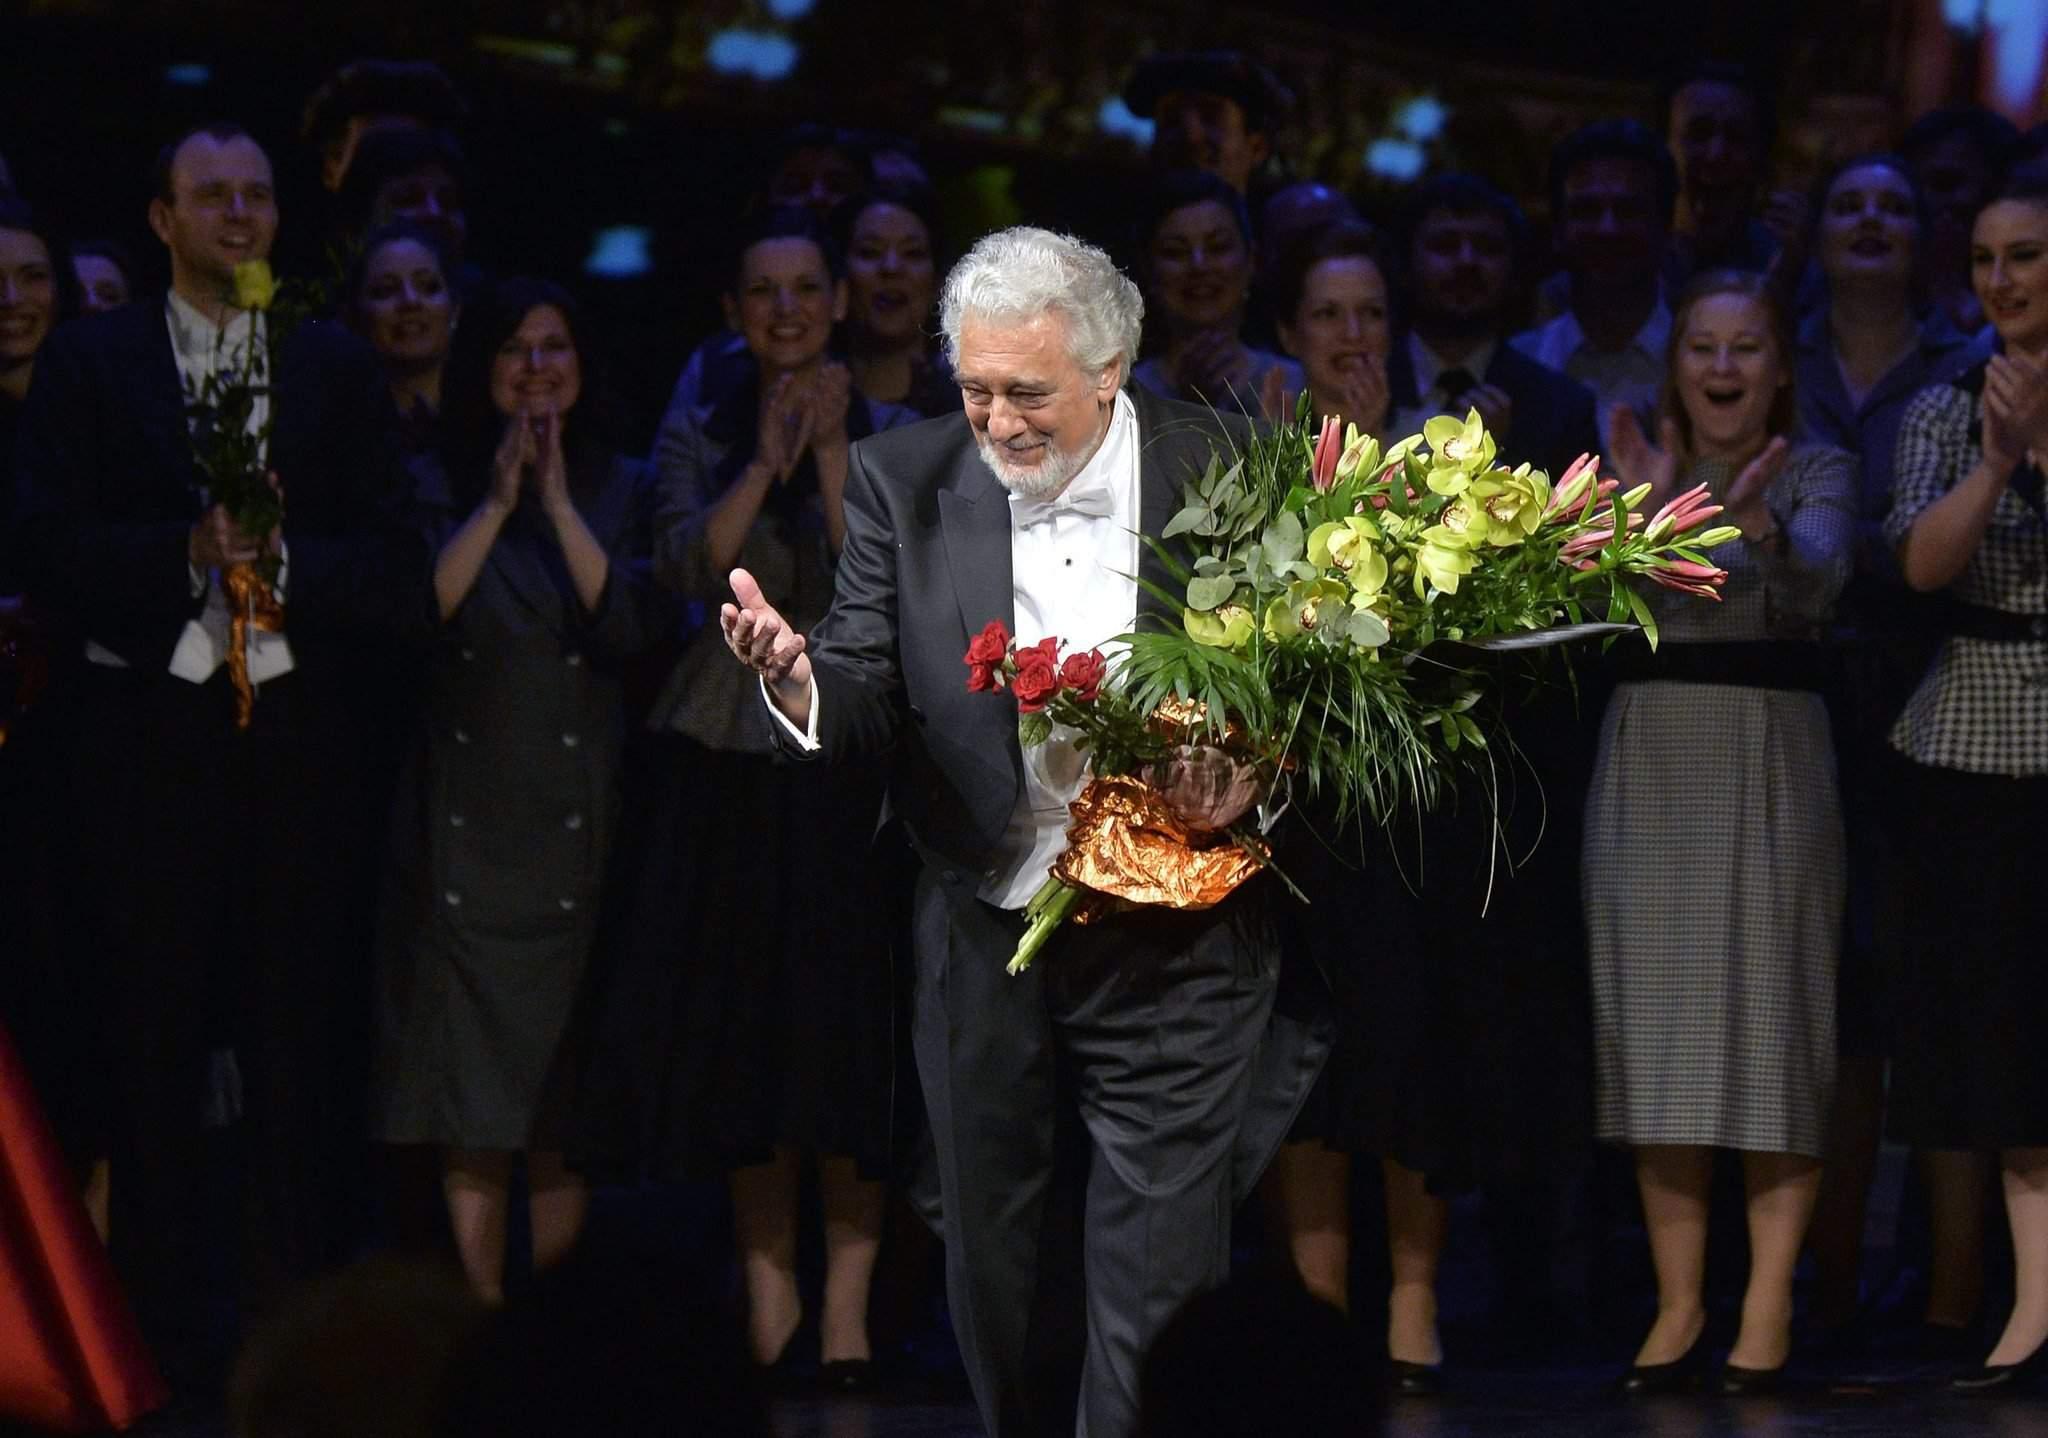 Plácido Domingo in Hungary – Photos, Video